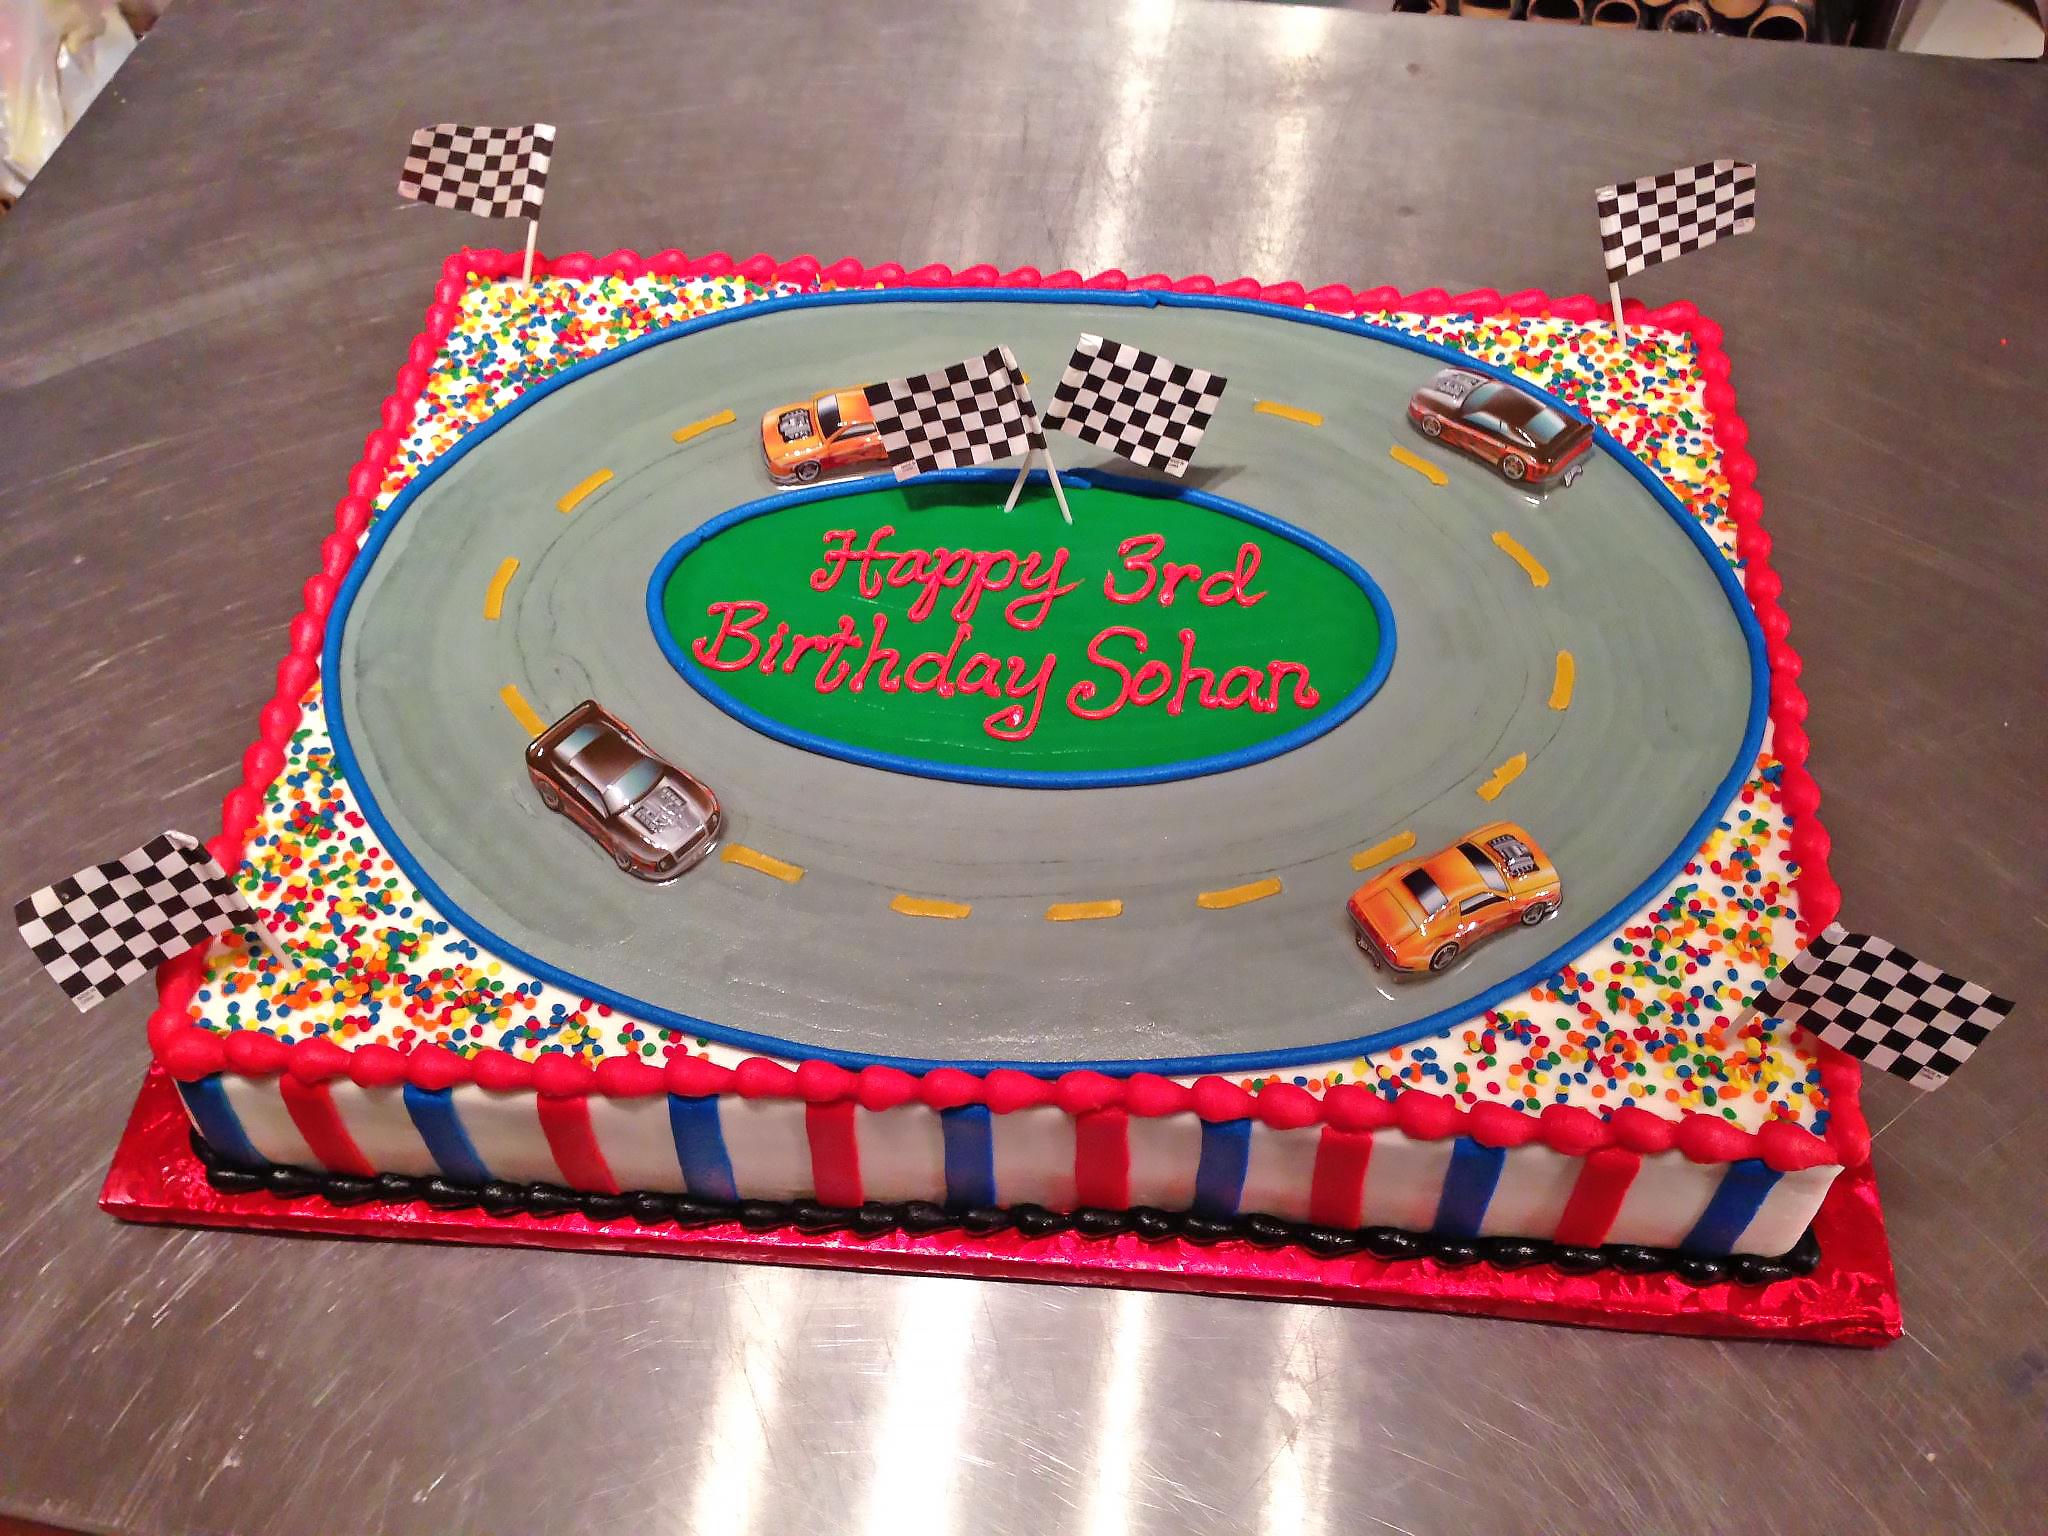 3rd birthday boys cake car 839 Birthday Cake Delivery In Dallas Texas